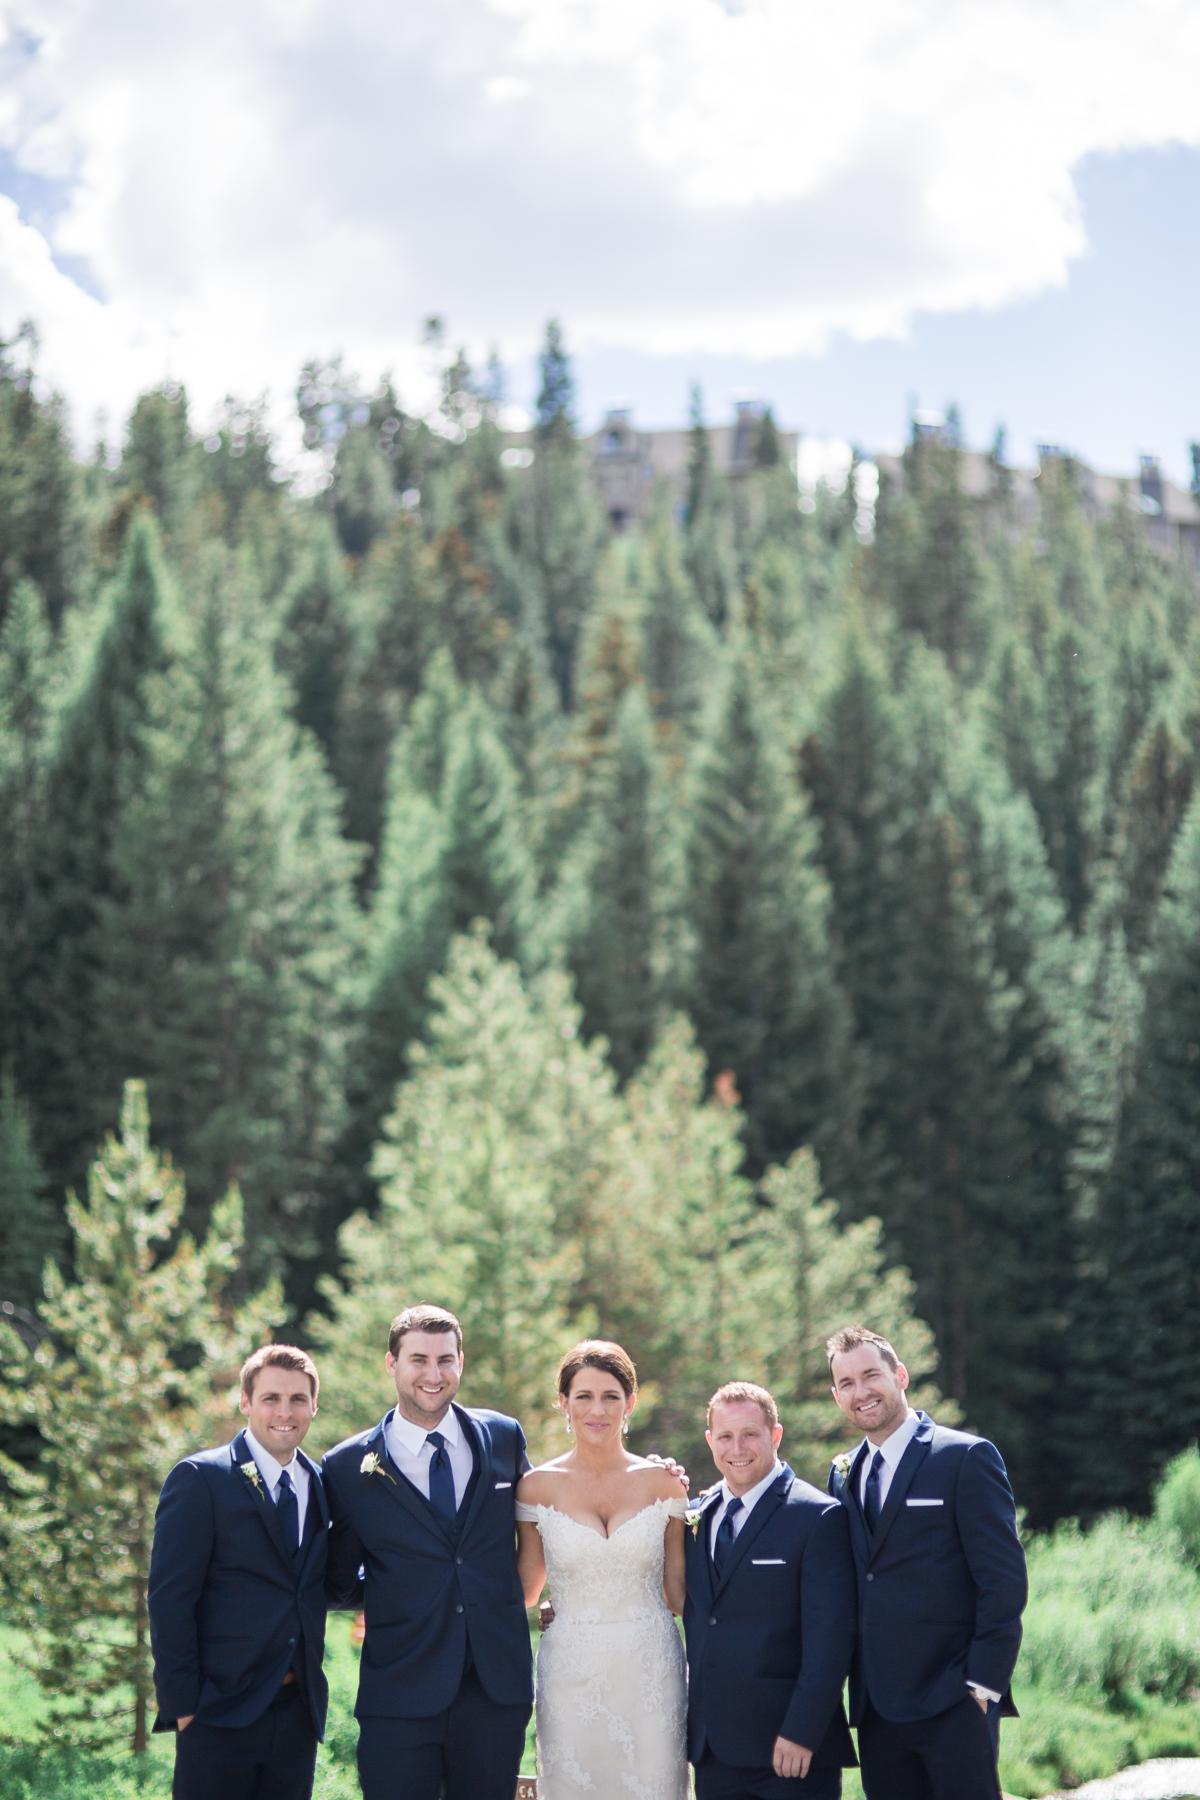 StaciDesign-Colorado-Wedding-5076.jpg